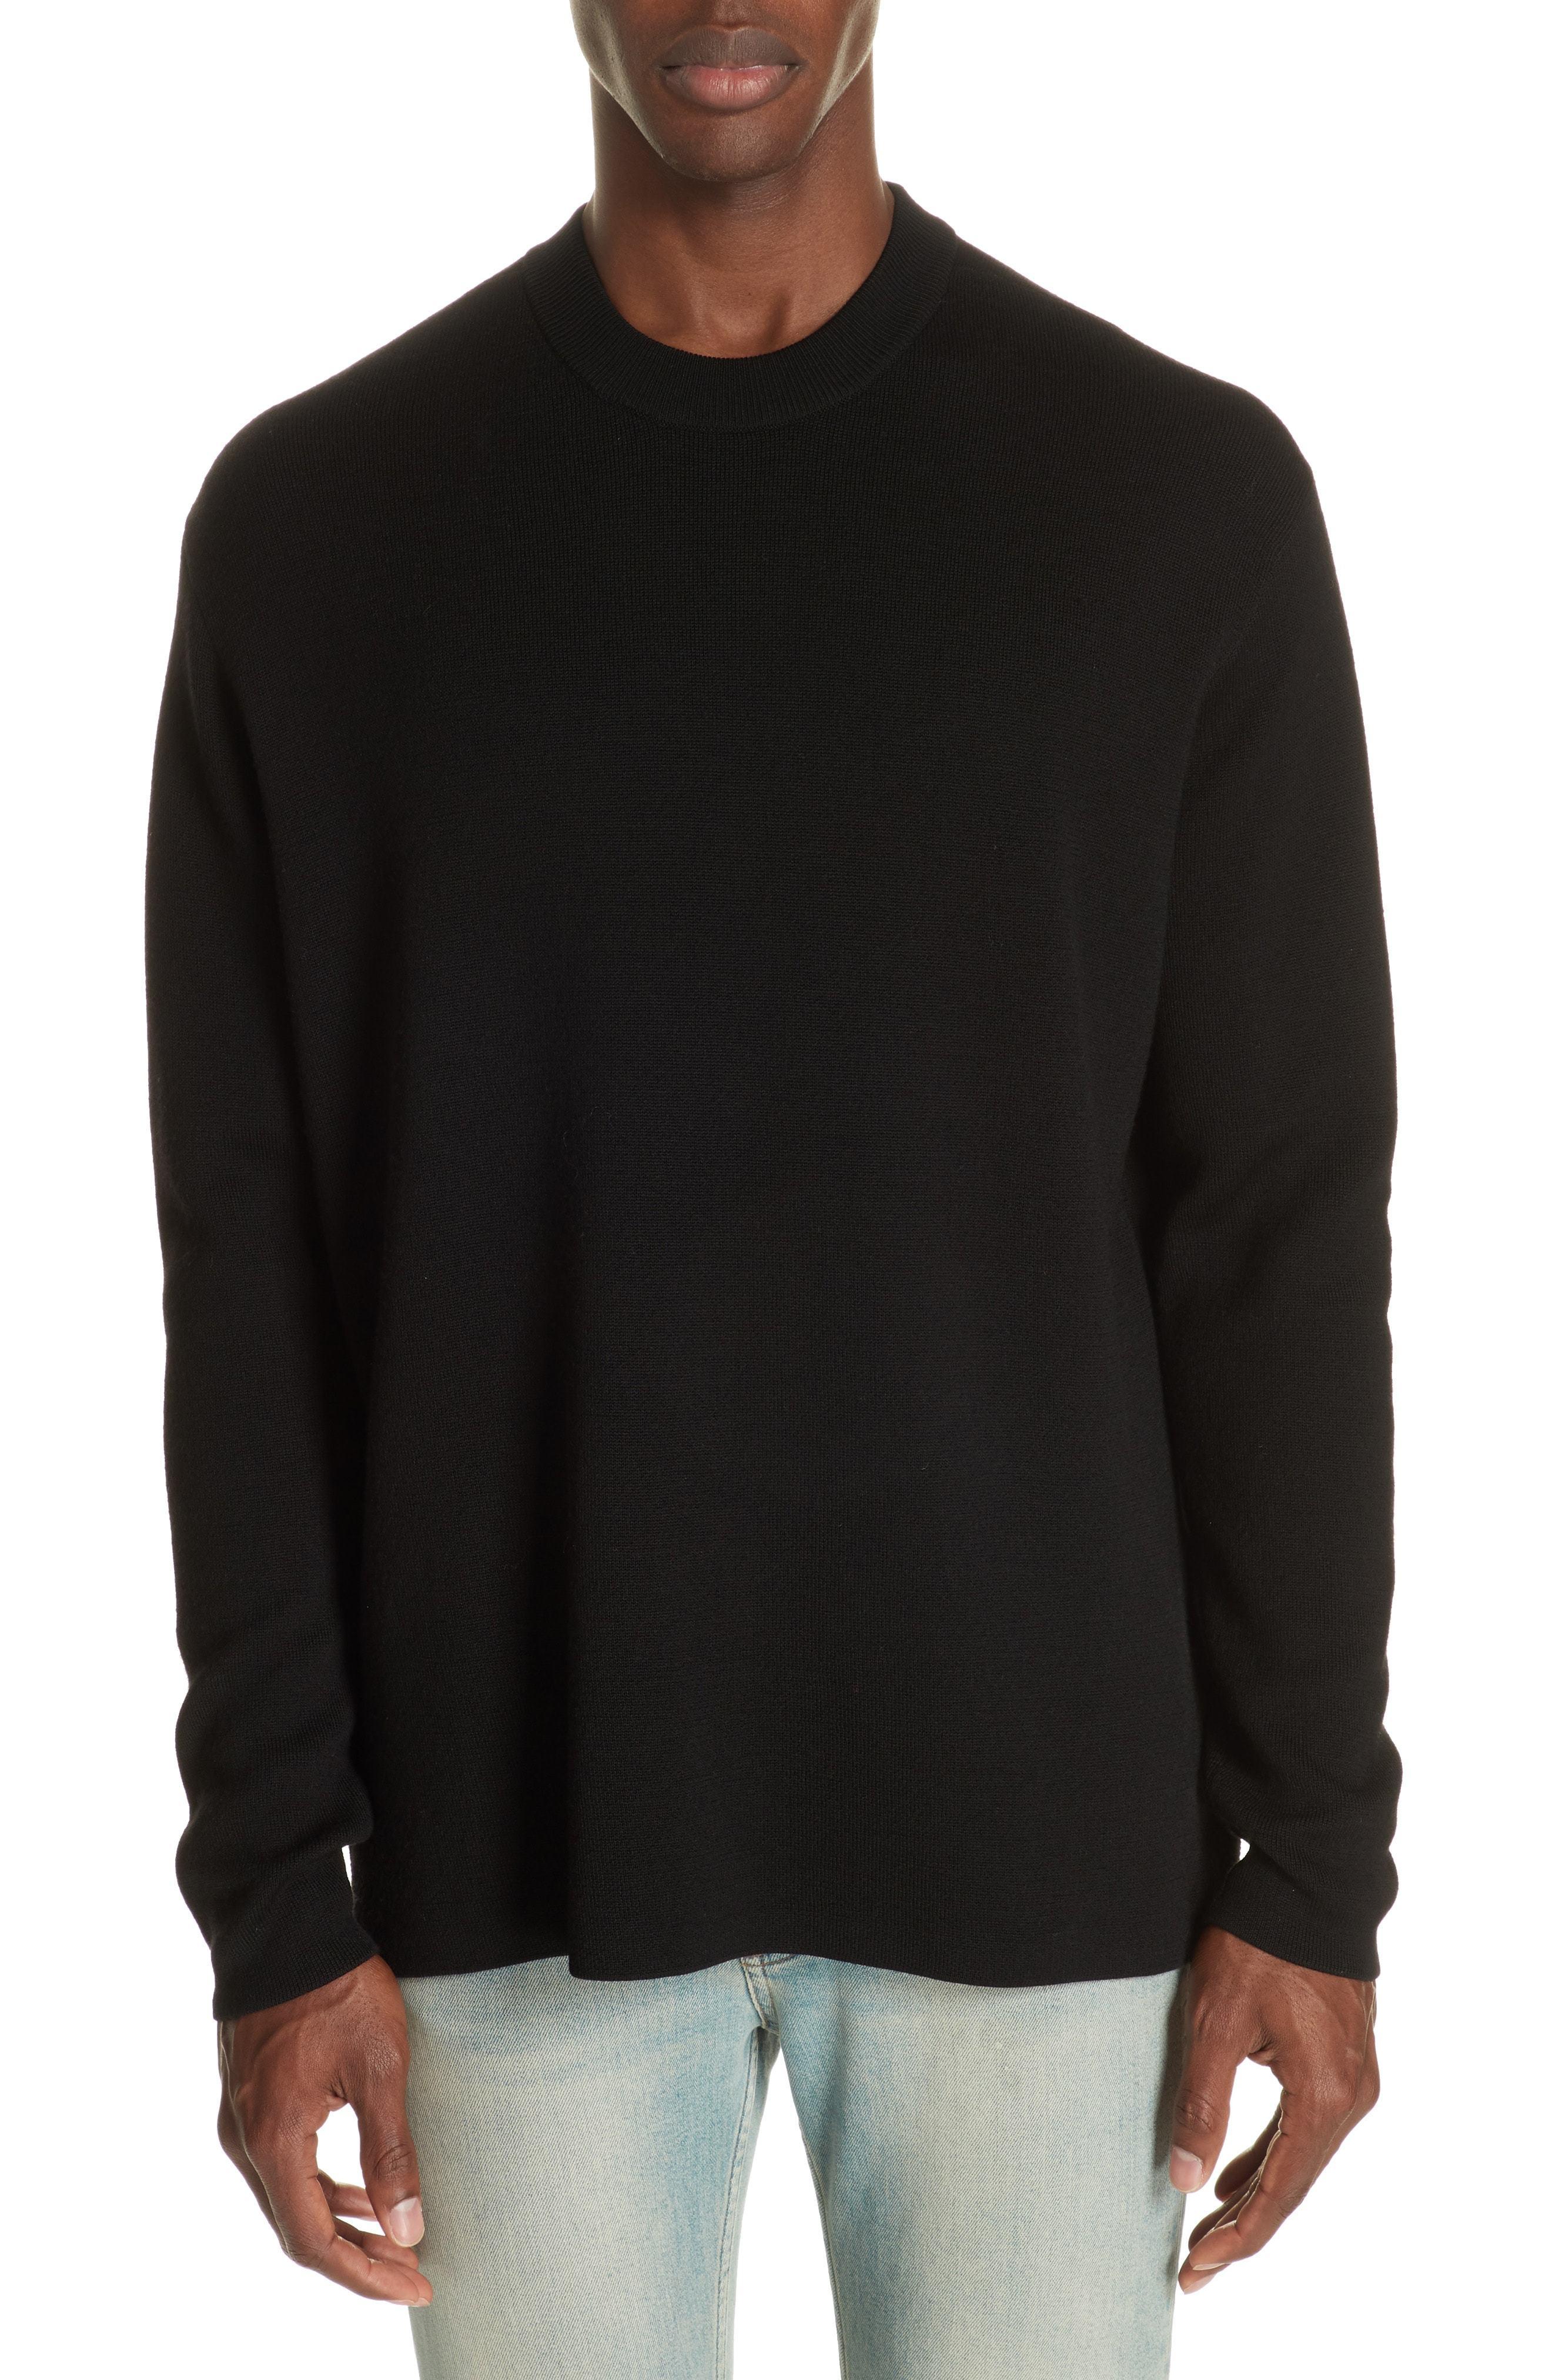 Acne Studios Nicha Wool Cotton Blend Sweater